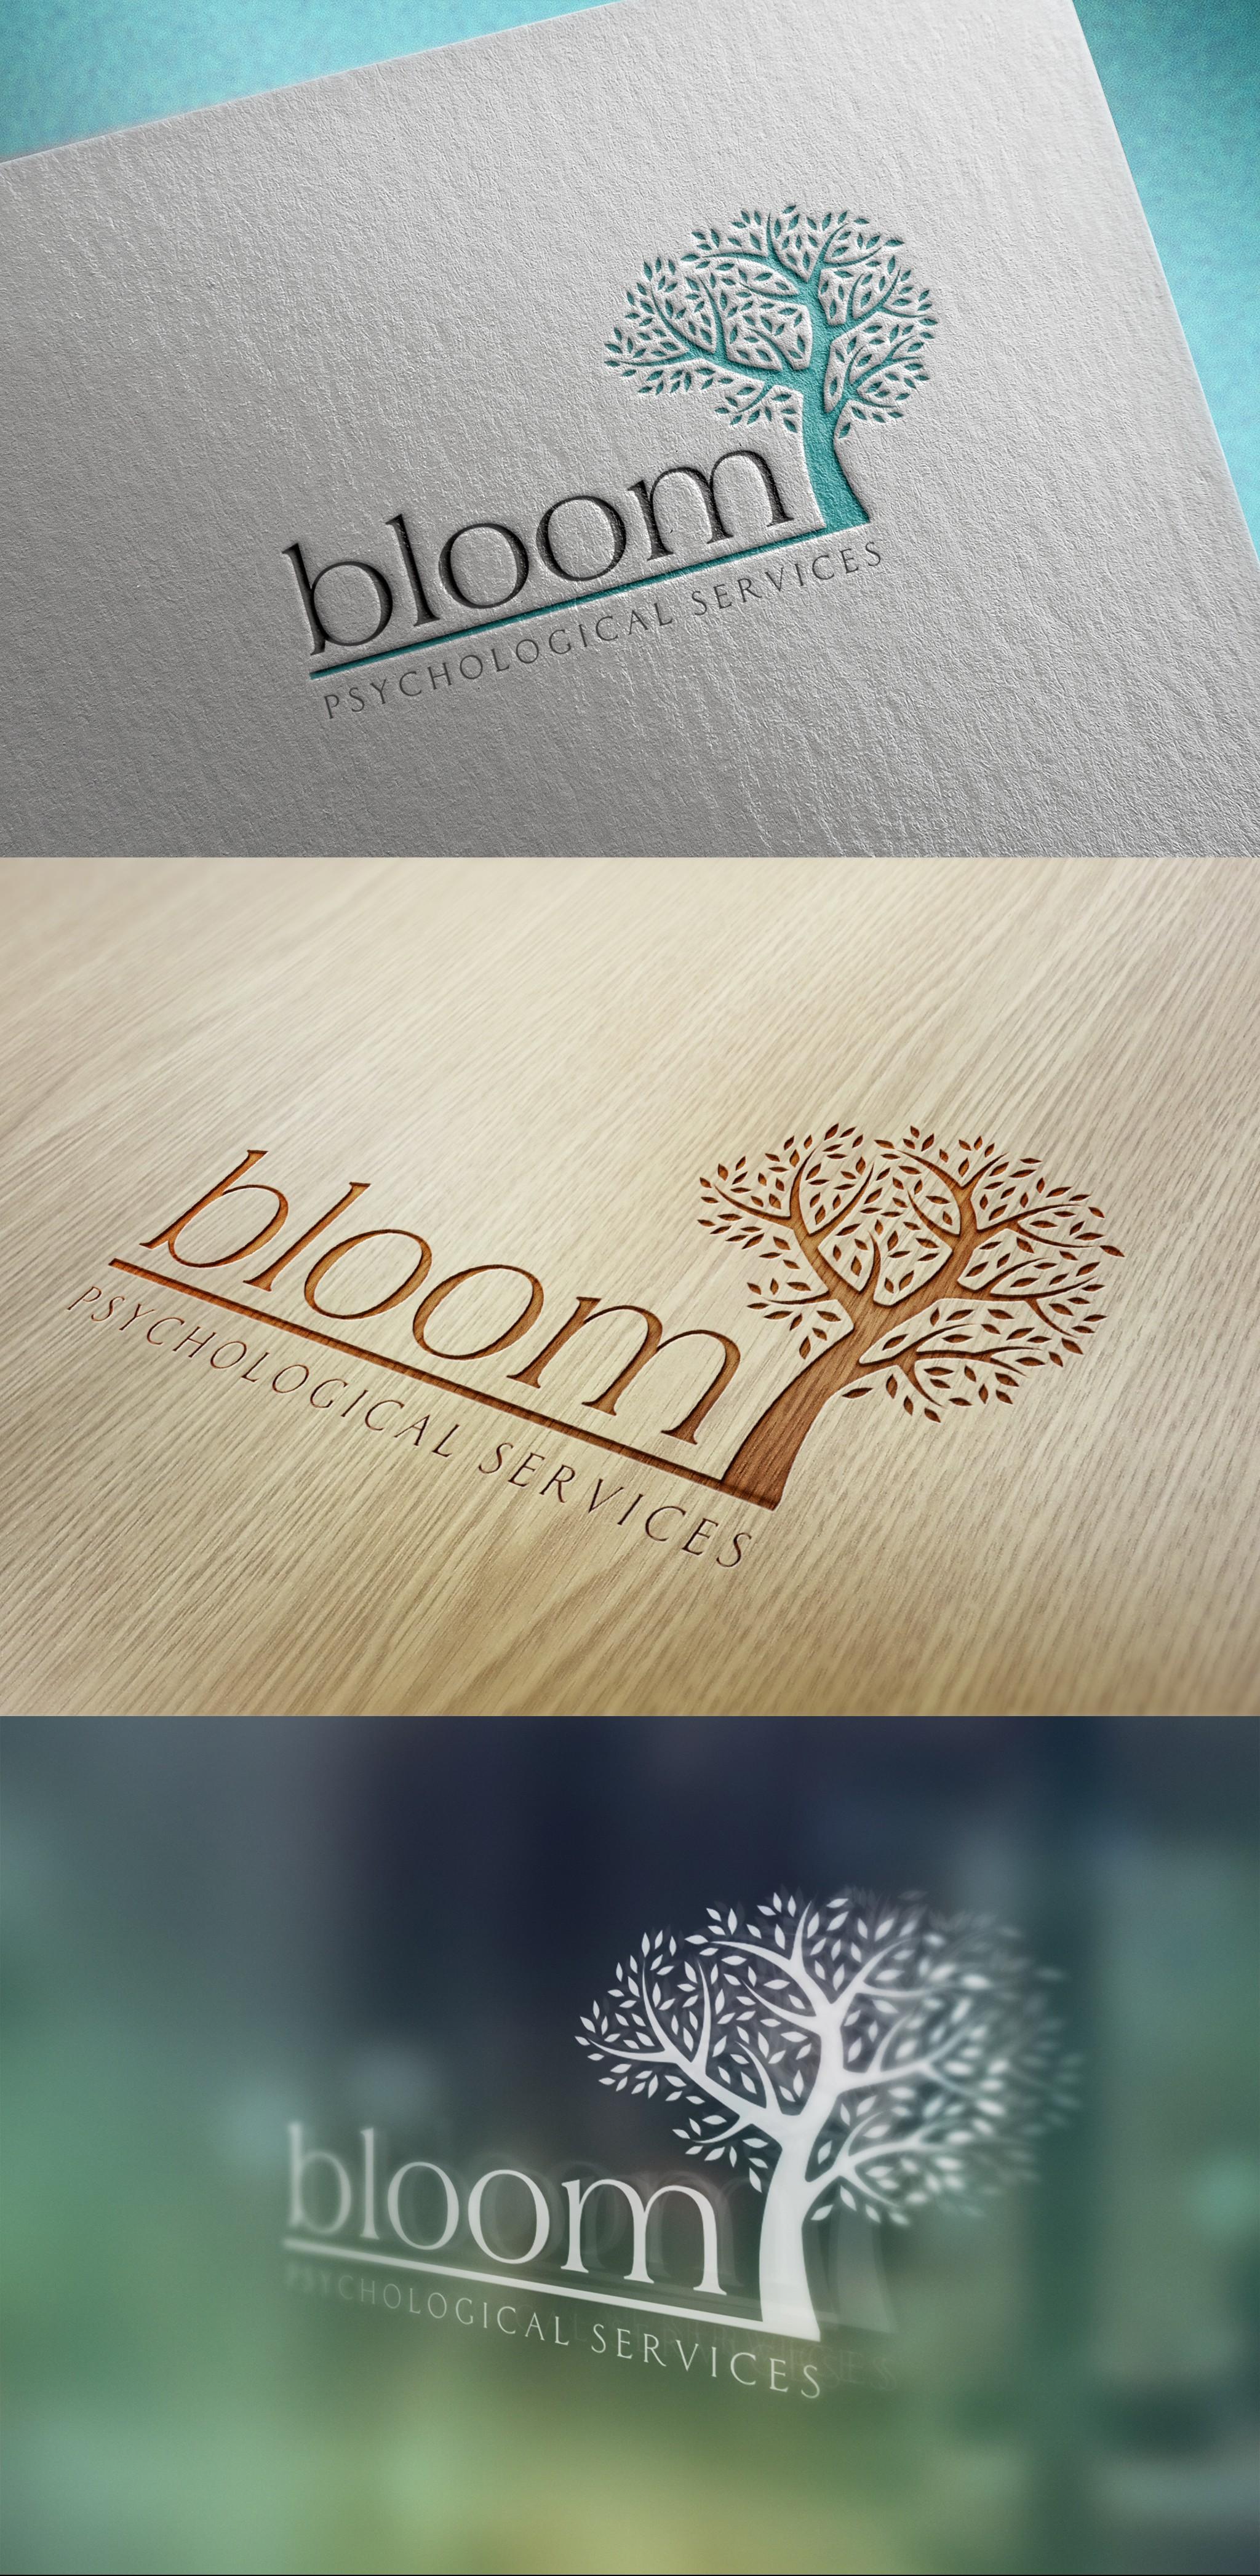 ELEGANT & EARTHY logo needed for Bloom Psychological Services